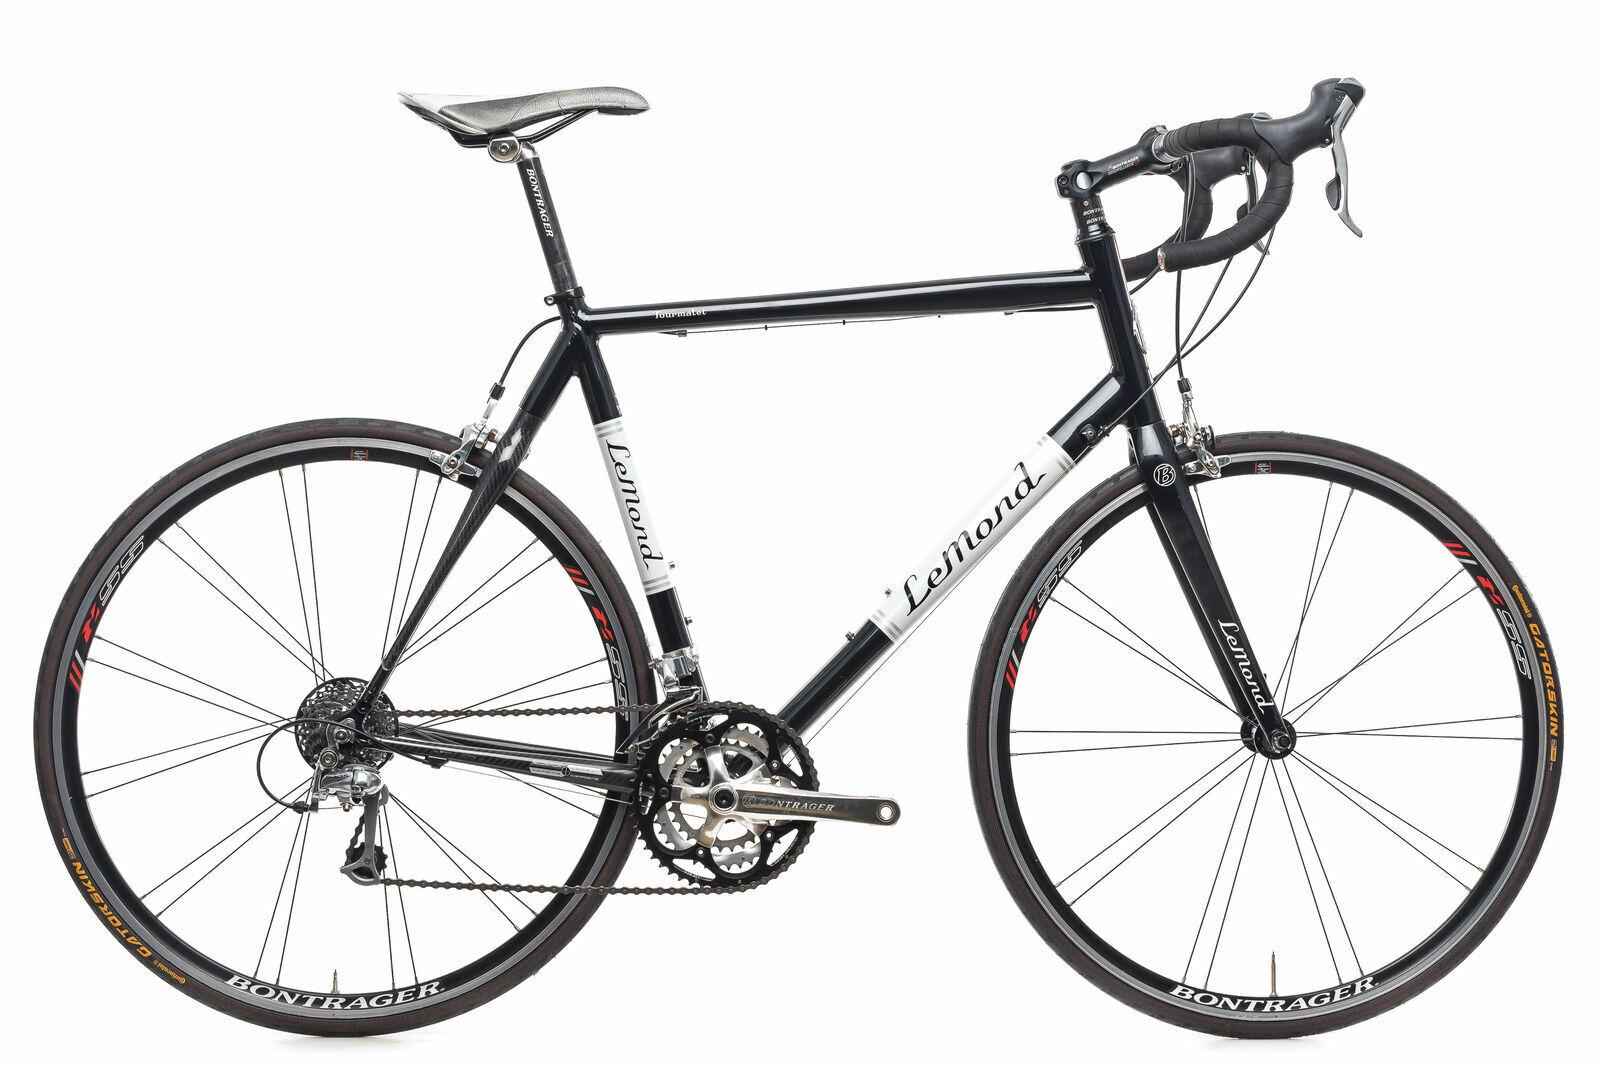 Lemond Deluxe Black Bicycle Handlebar Bag NEW!